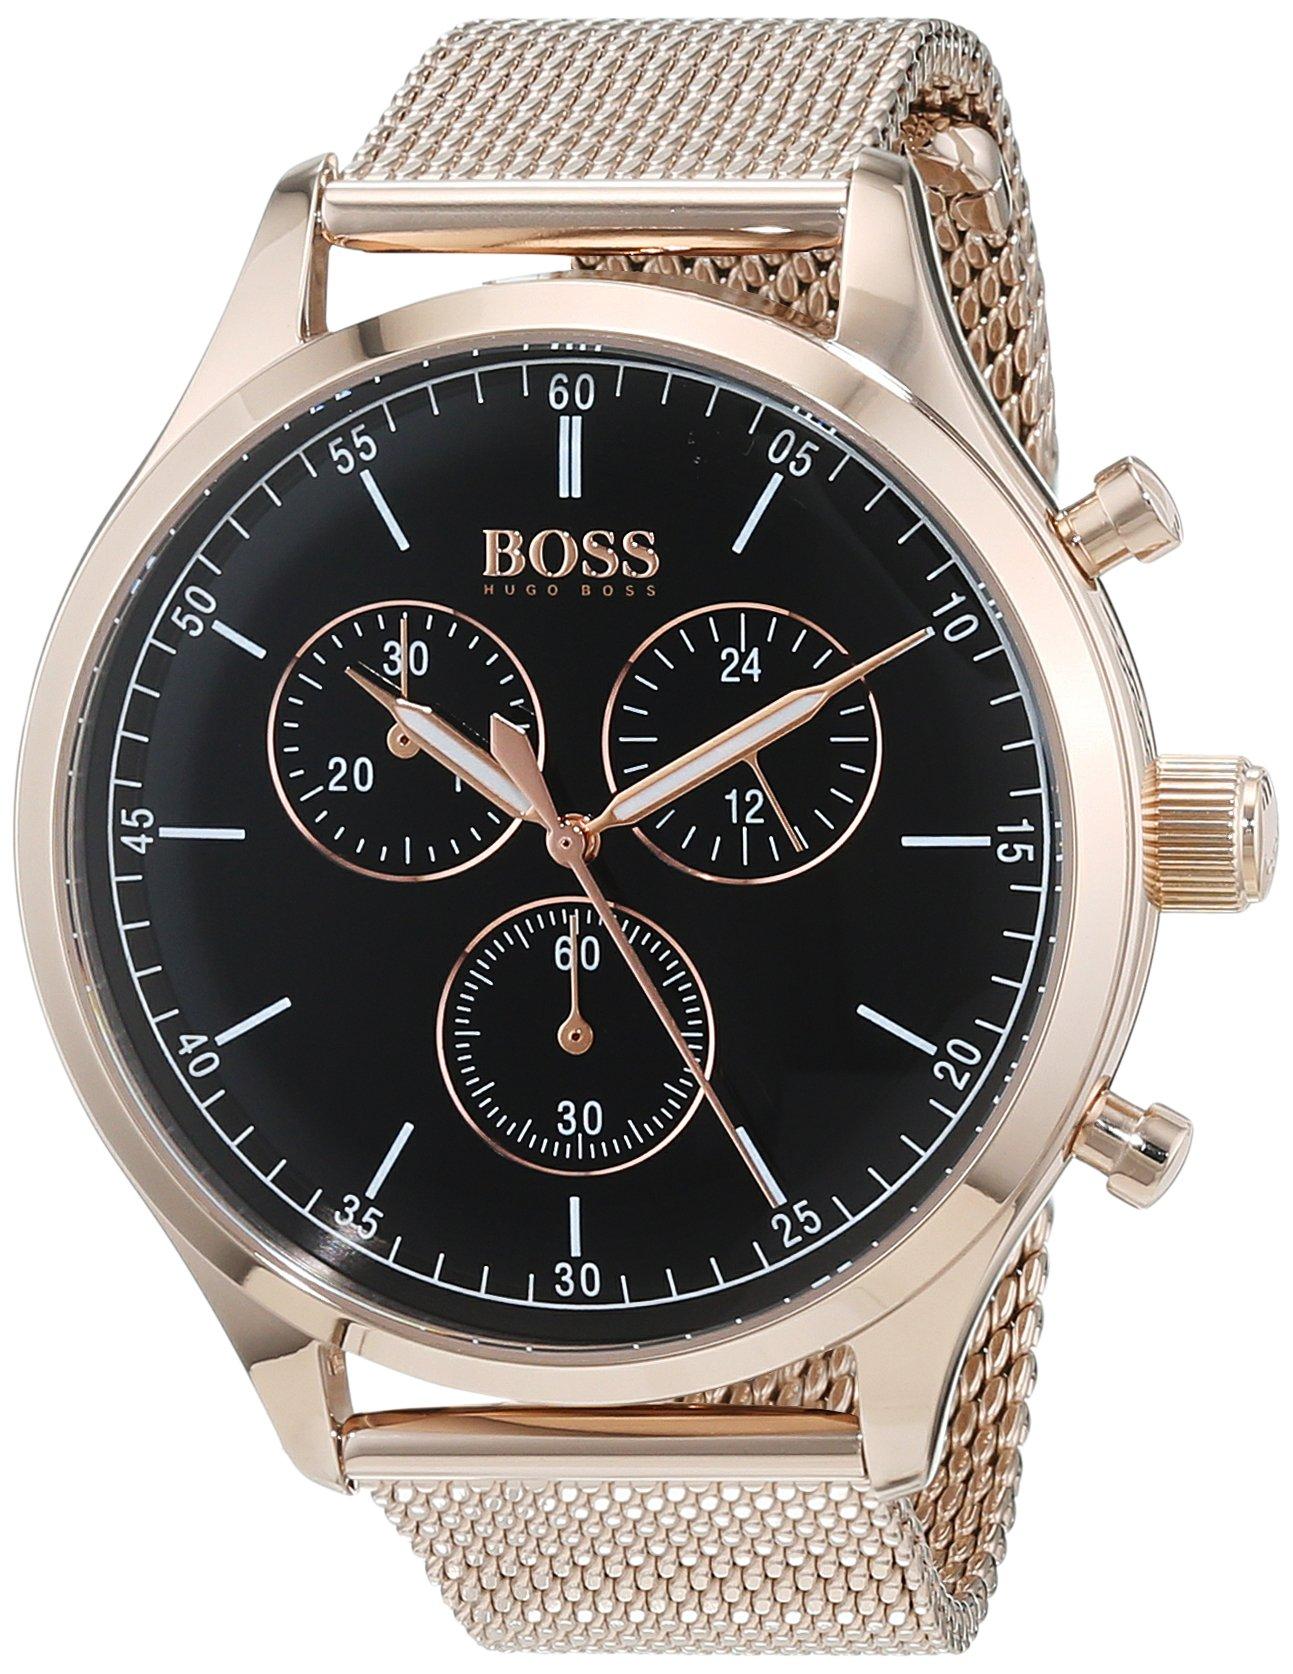 55886ff1a121 Hugo BOSS Reloj Cronógrafo para Hombre de Cuarzo con Correa en Acero  Inoxidable 1513548